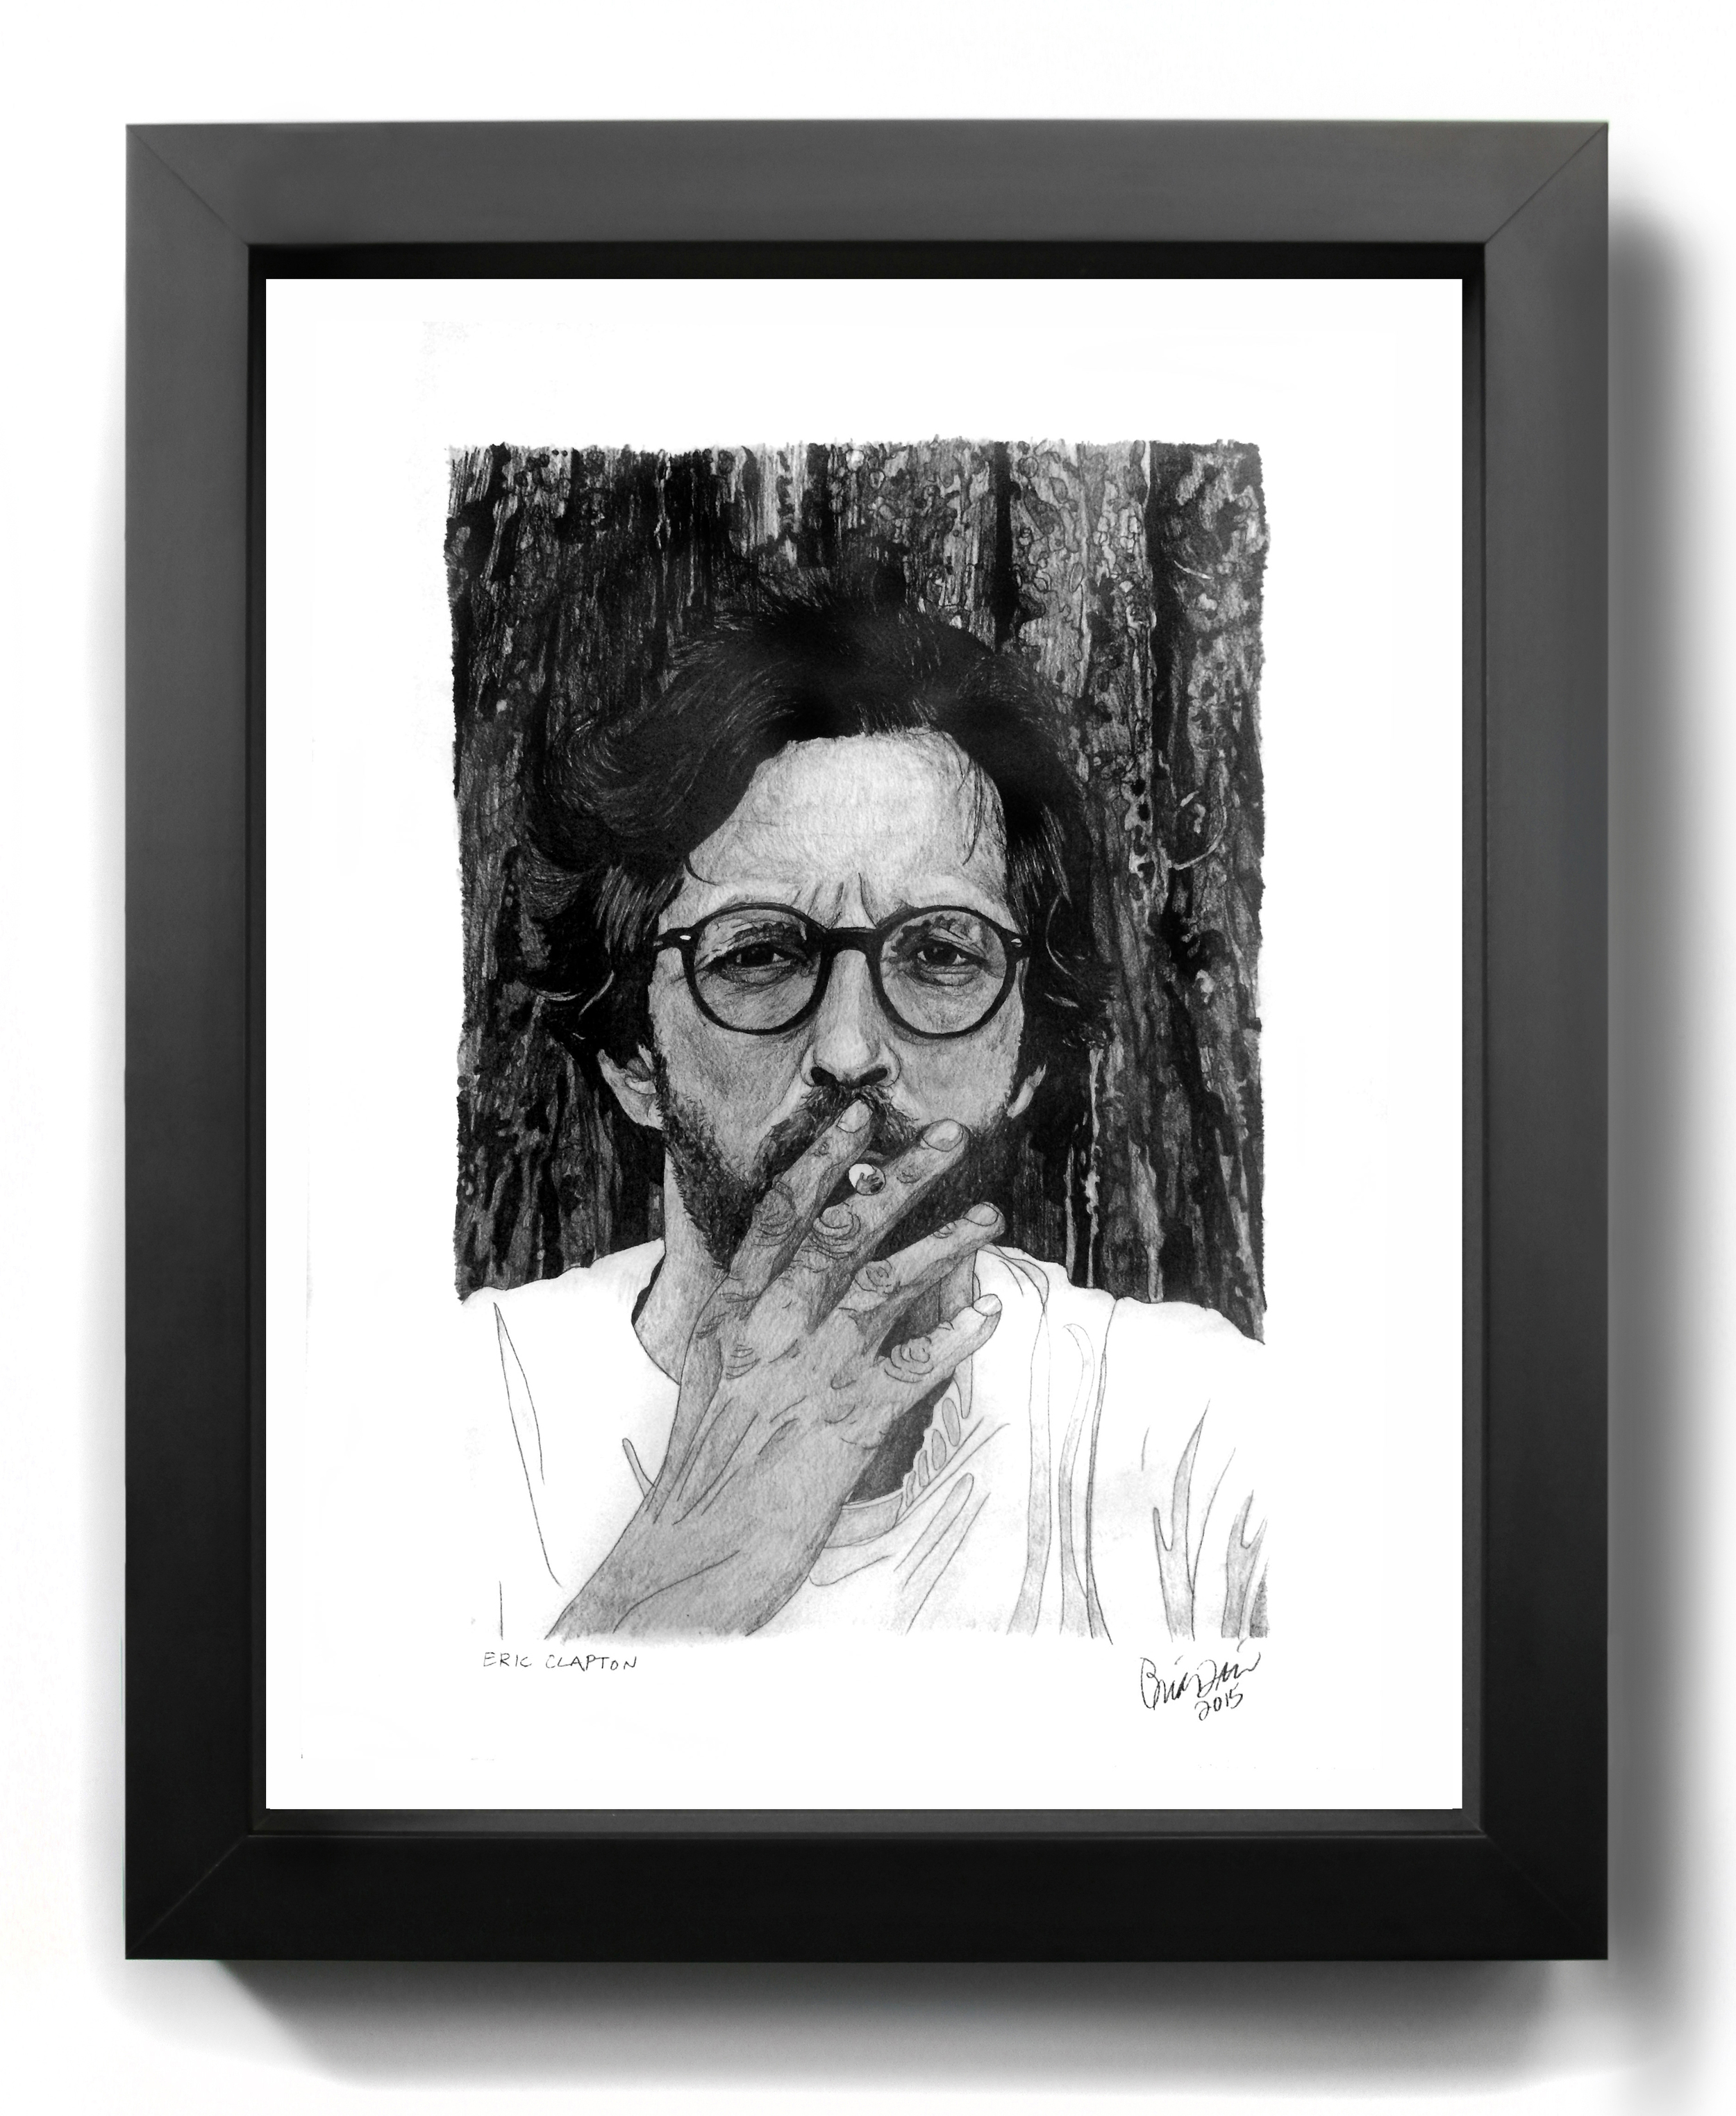 Clapton_Print.jpg